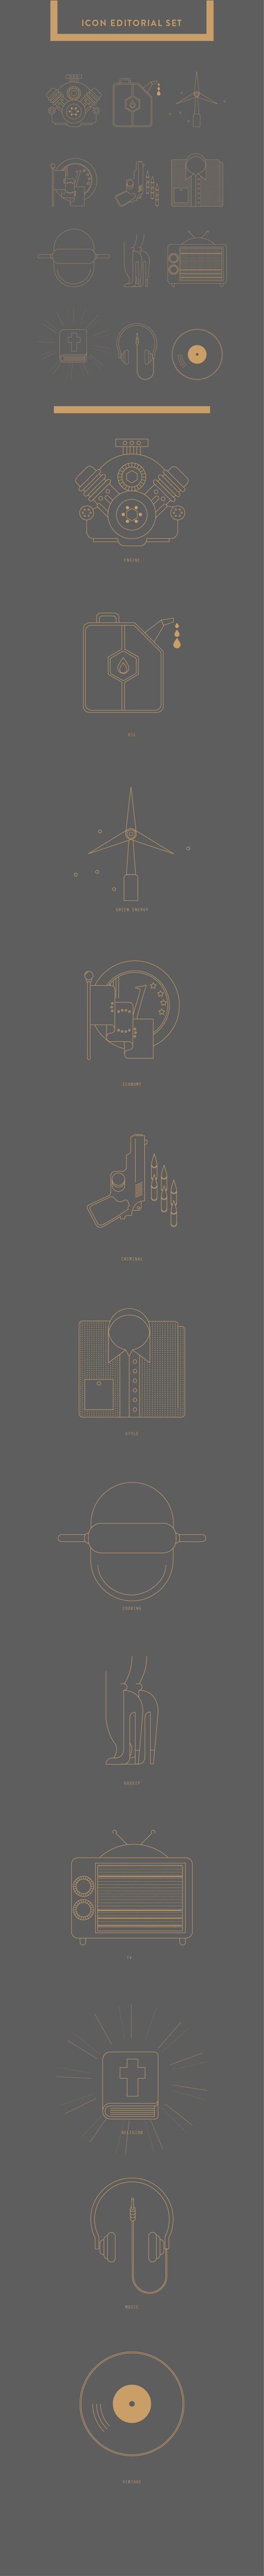 ICON EDITORIAL SET #2 by matteo franco, via Behance